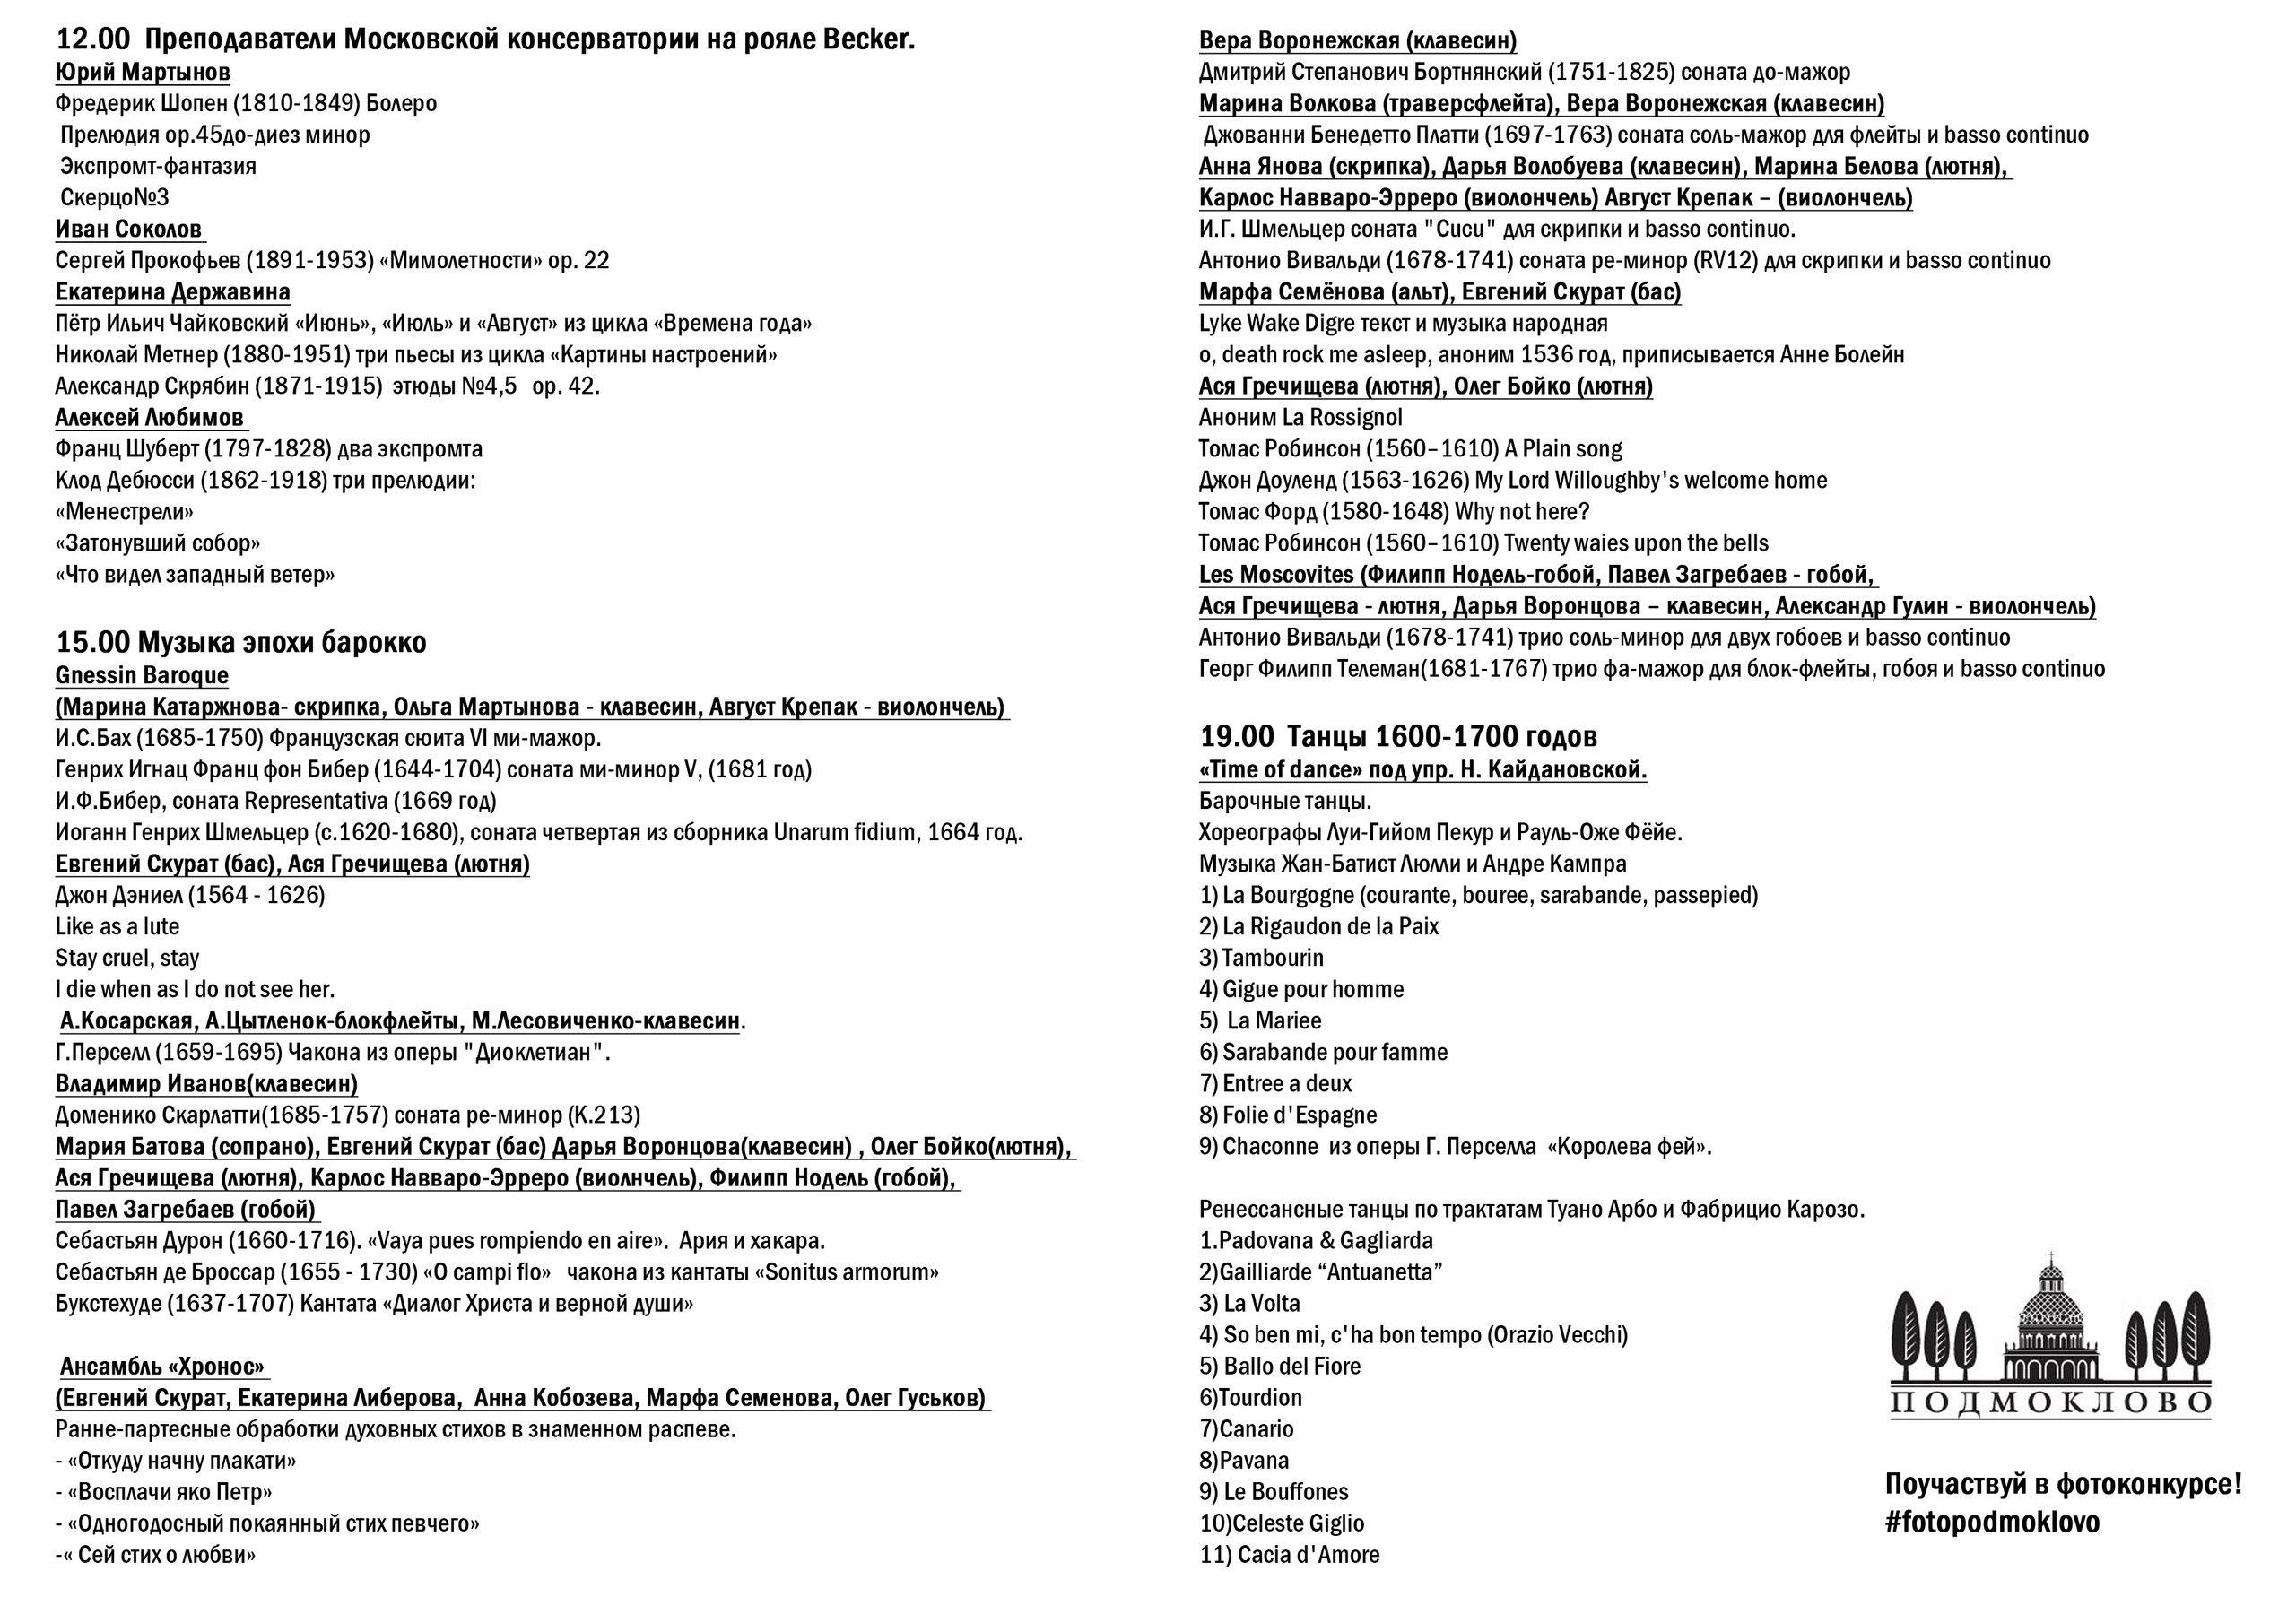 Фестиваль в Подмоклово 2017. Программа